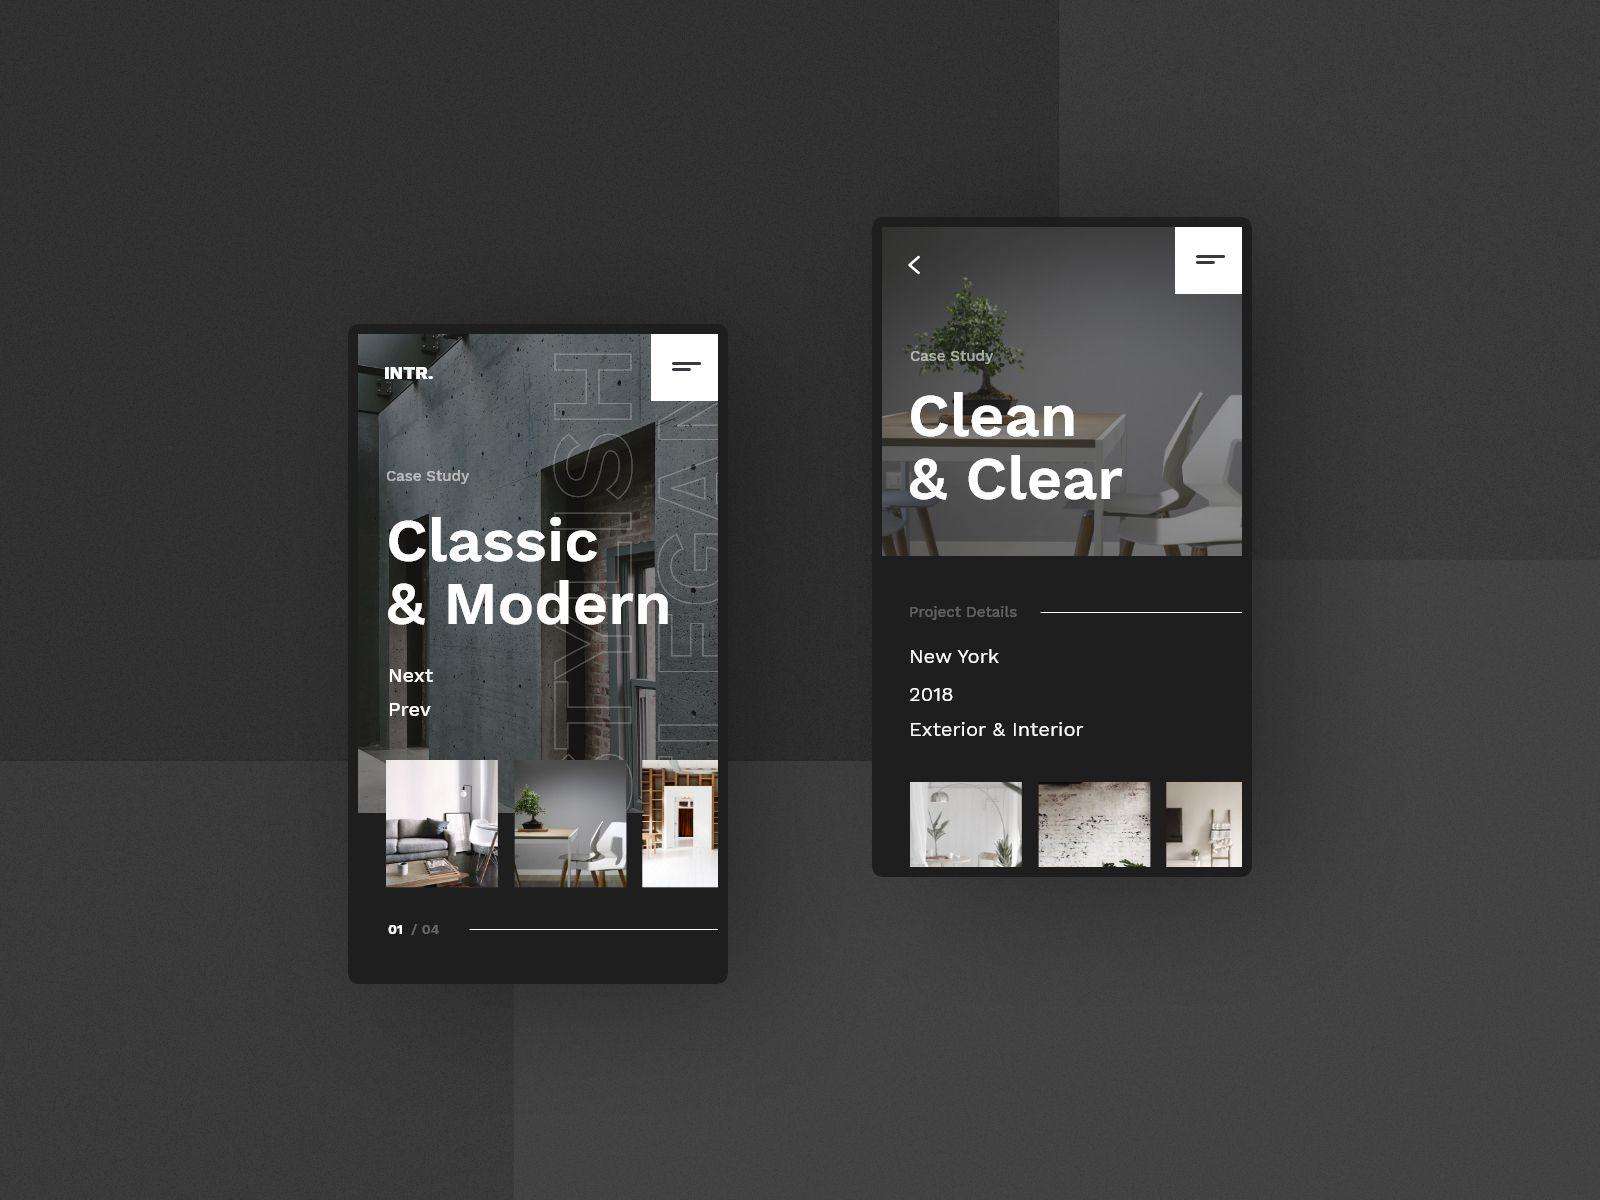 8 Intertiorstudio Mobile Website Concept Studio Interior Design Interior Phone Mobile App Ho Real Estate Web Design Web Design Inspiration Web Design Agency